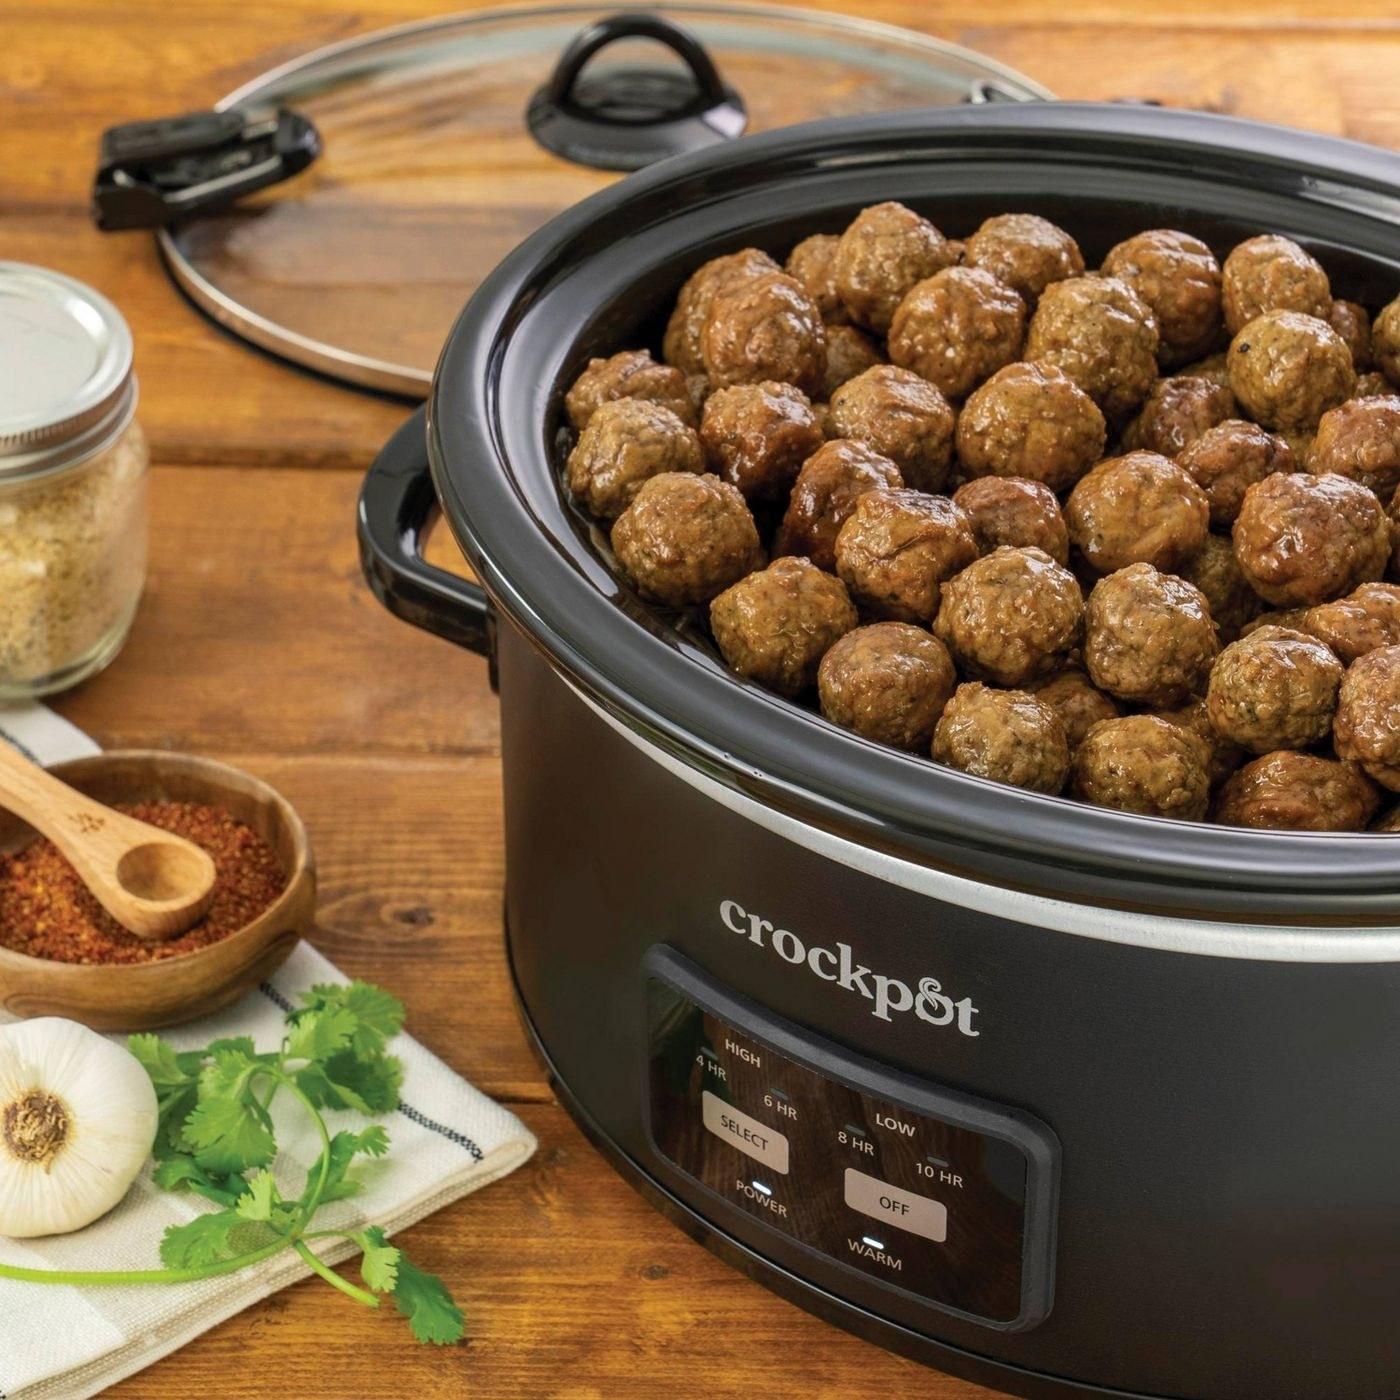 The crock pot cooking meatballs